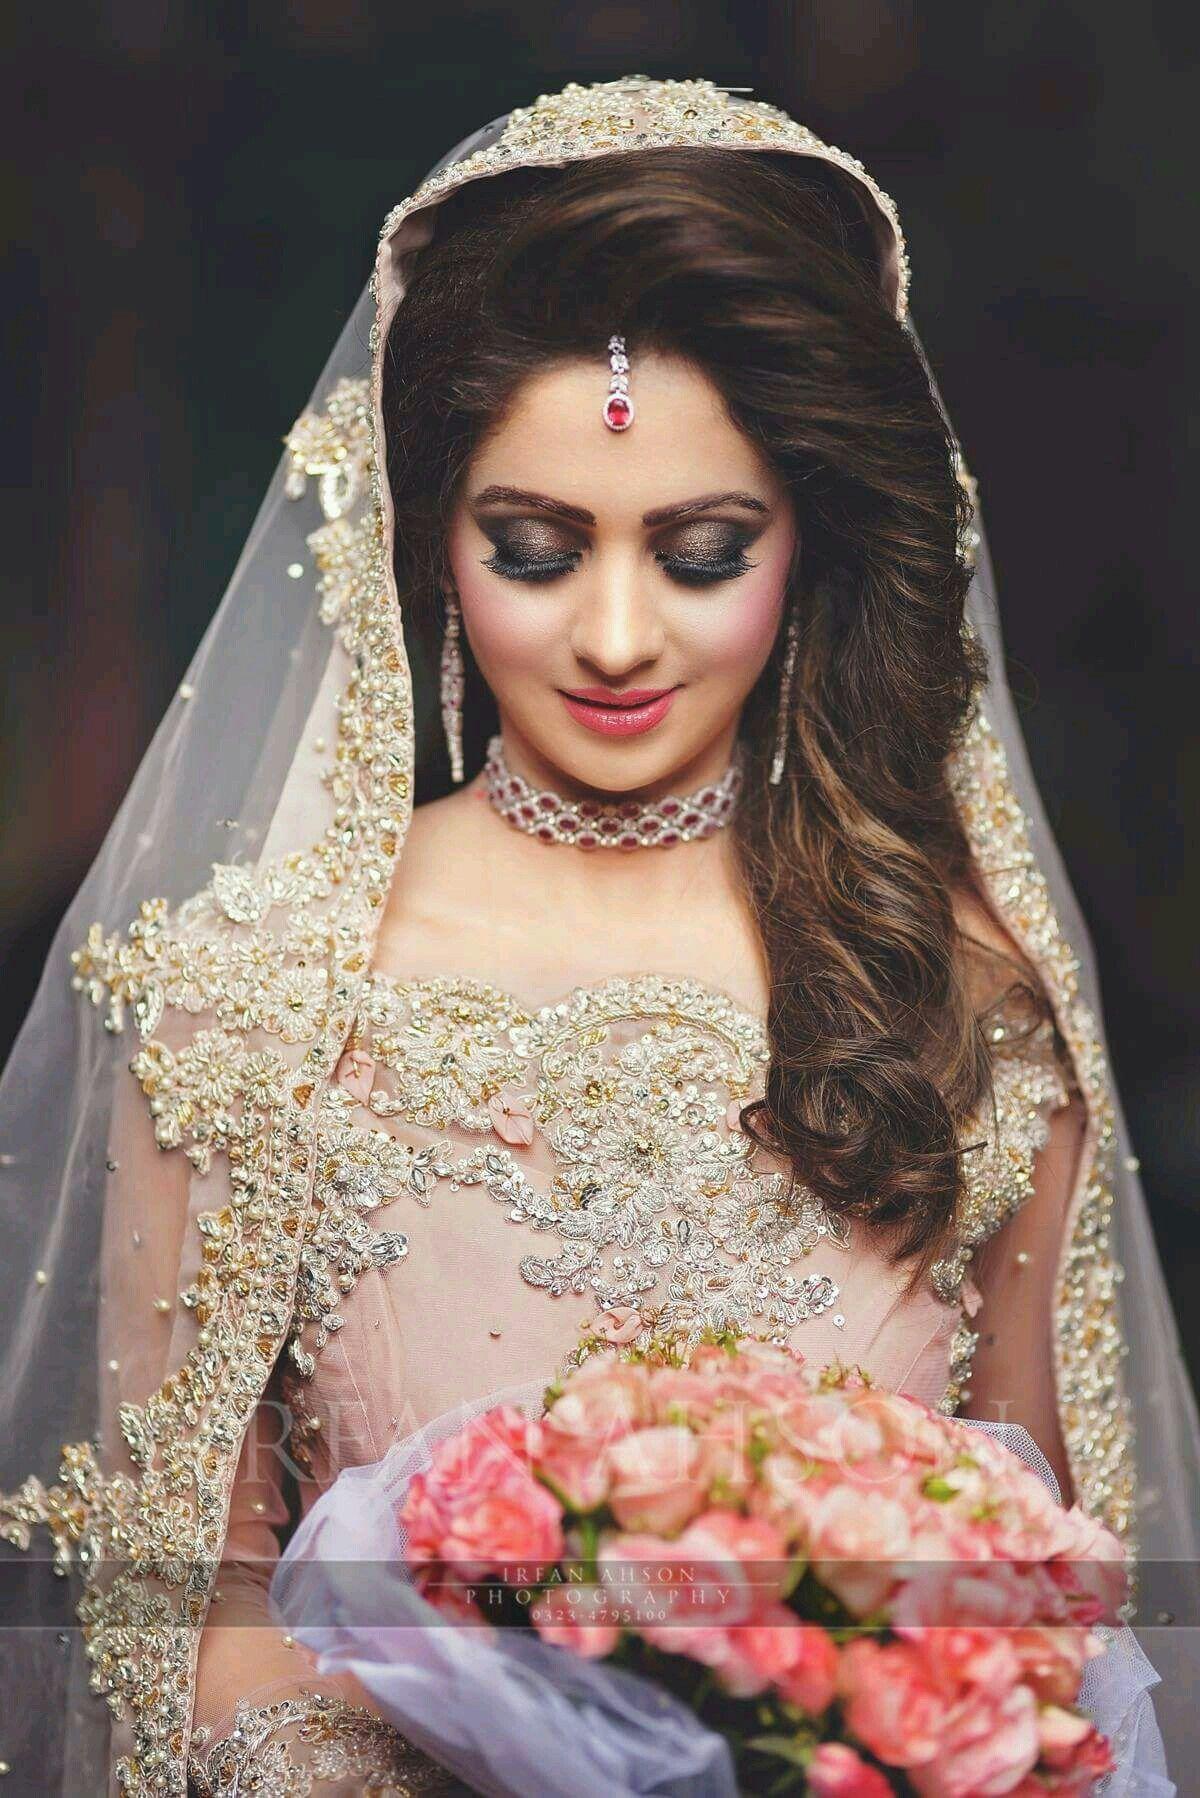 Pin by Syeda Ishrat on Brides | Pinterest